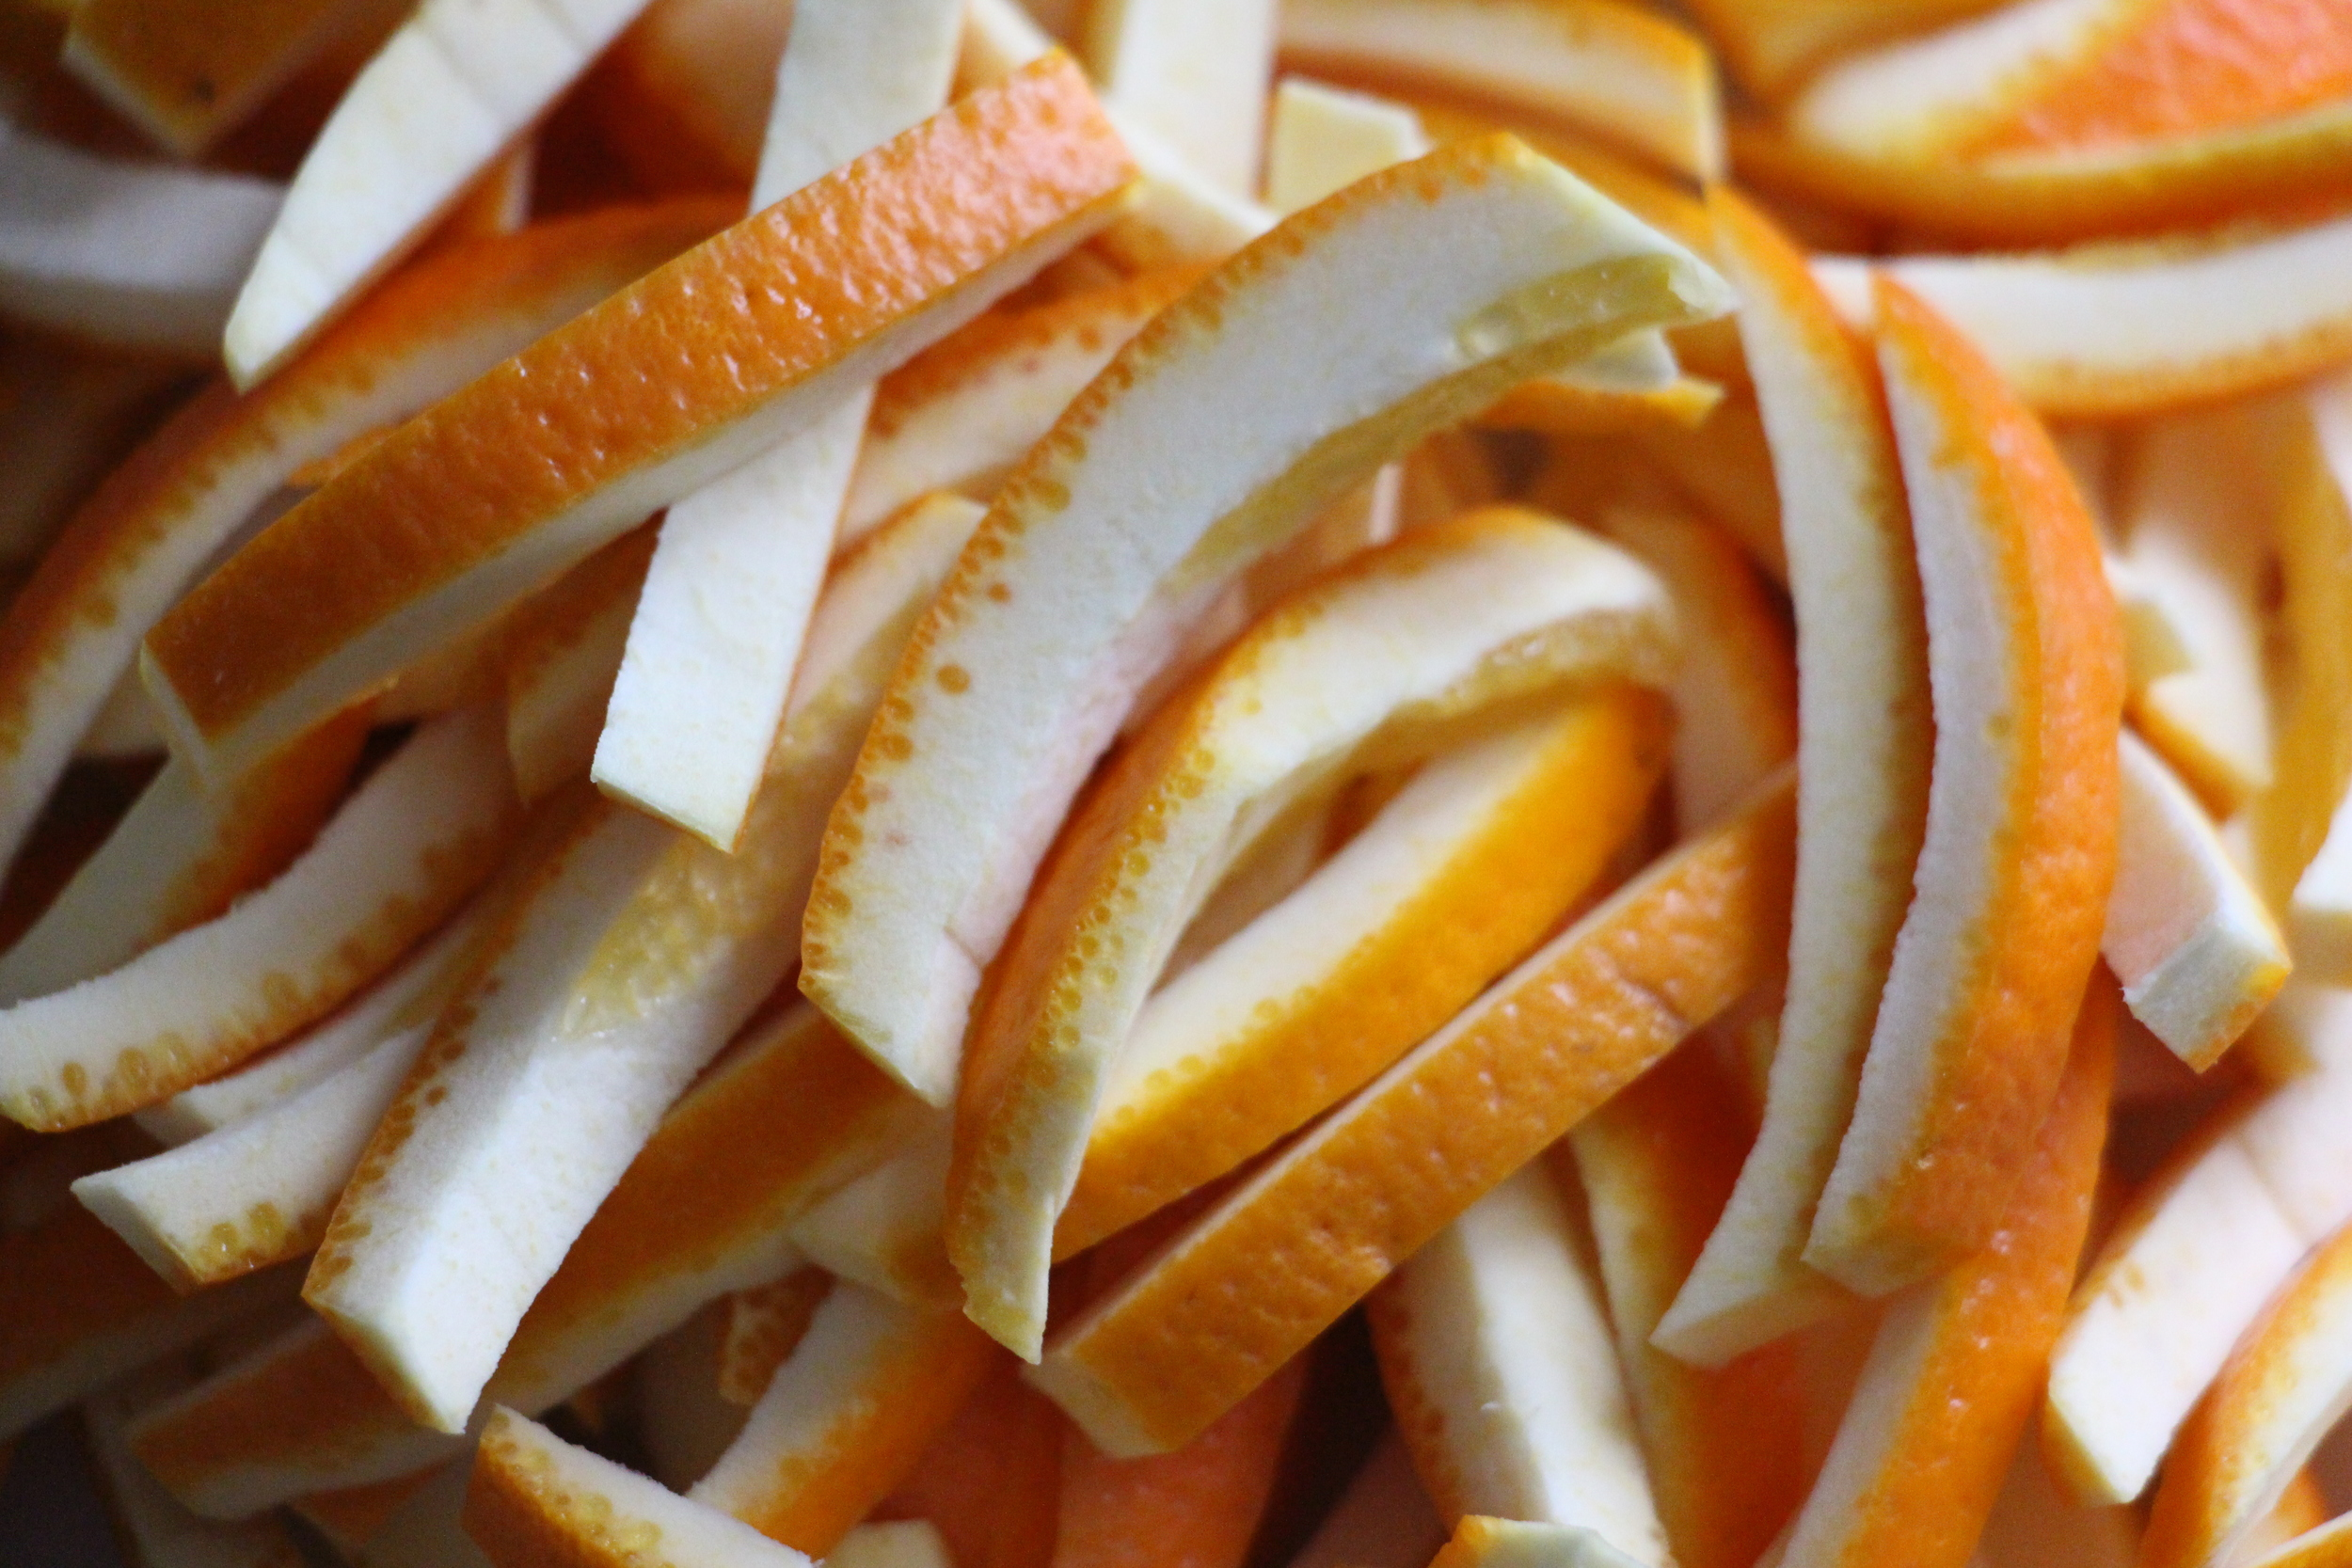 orange peel slices